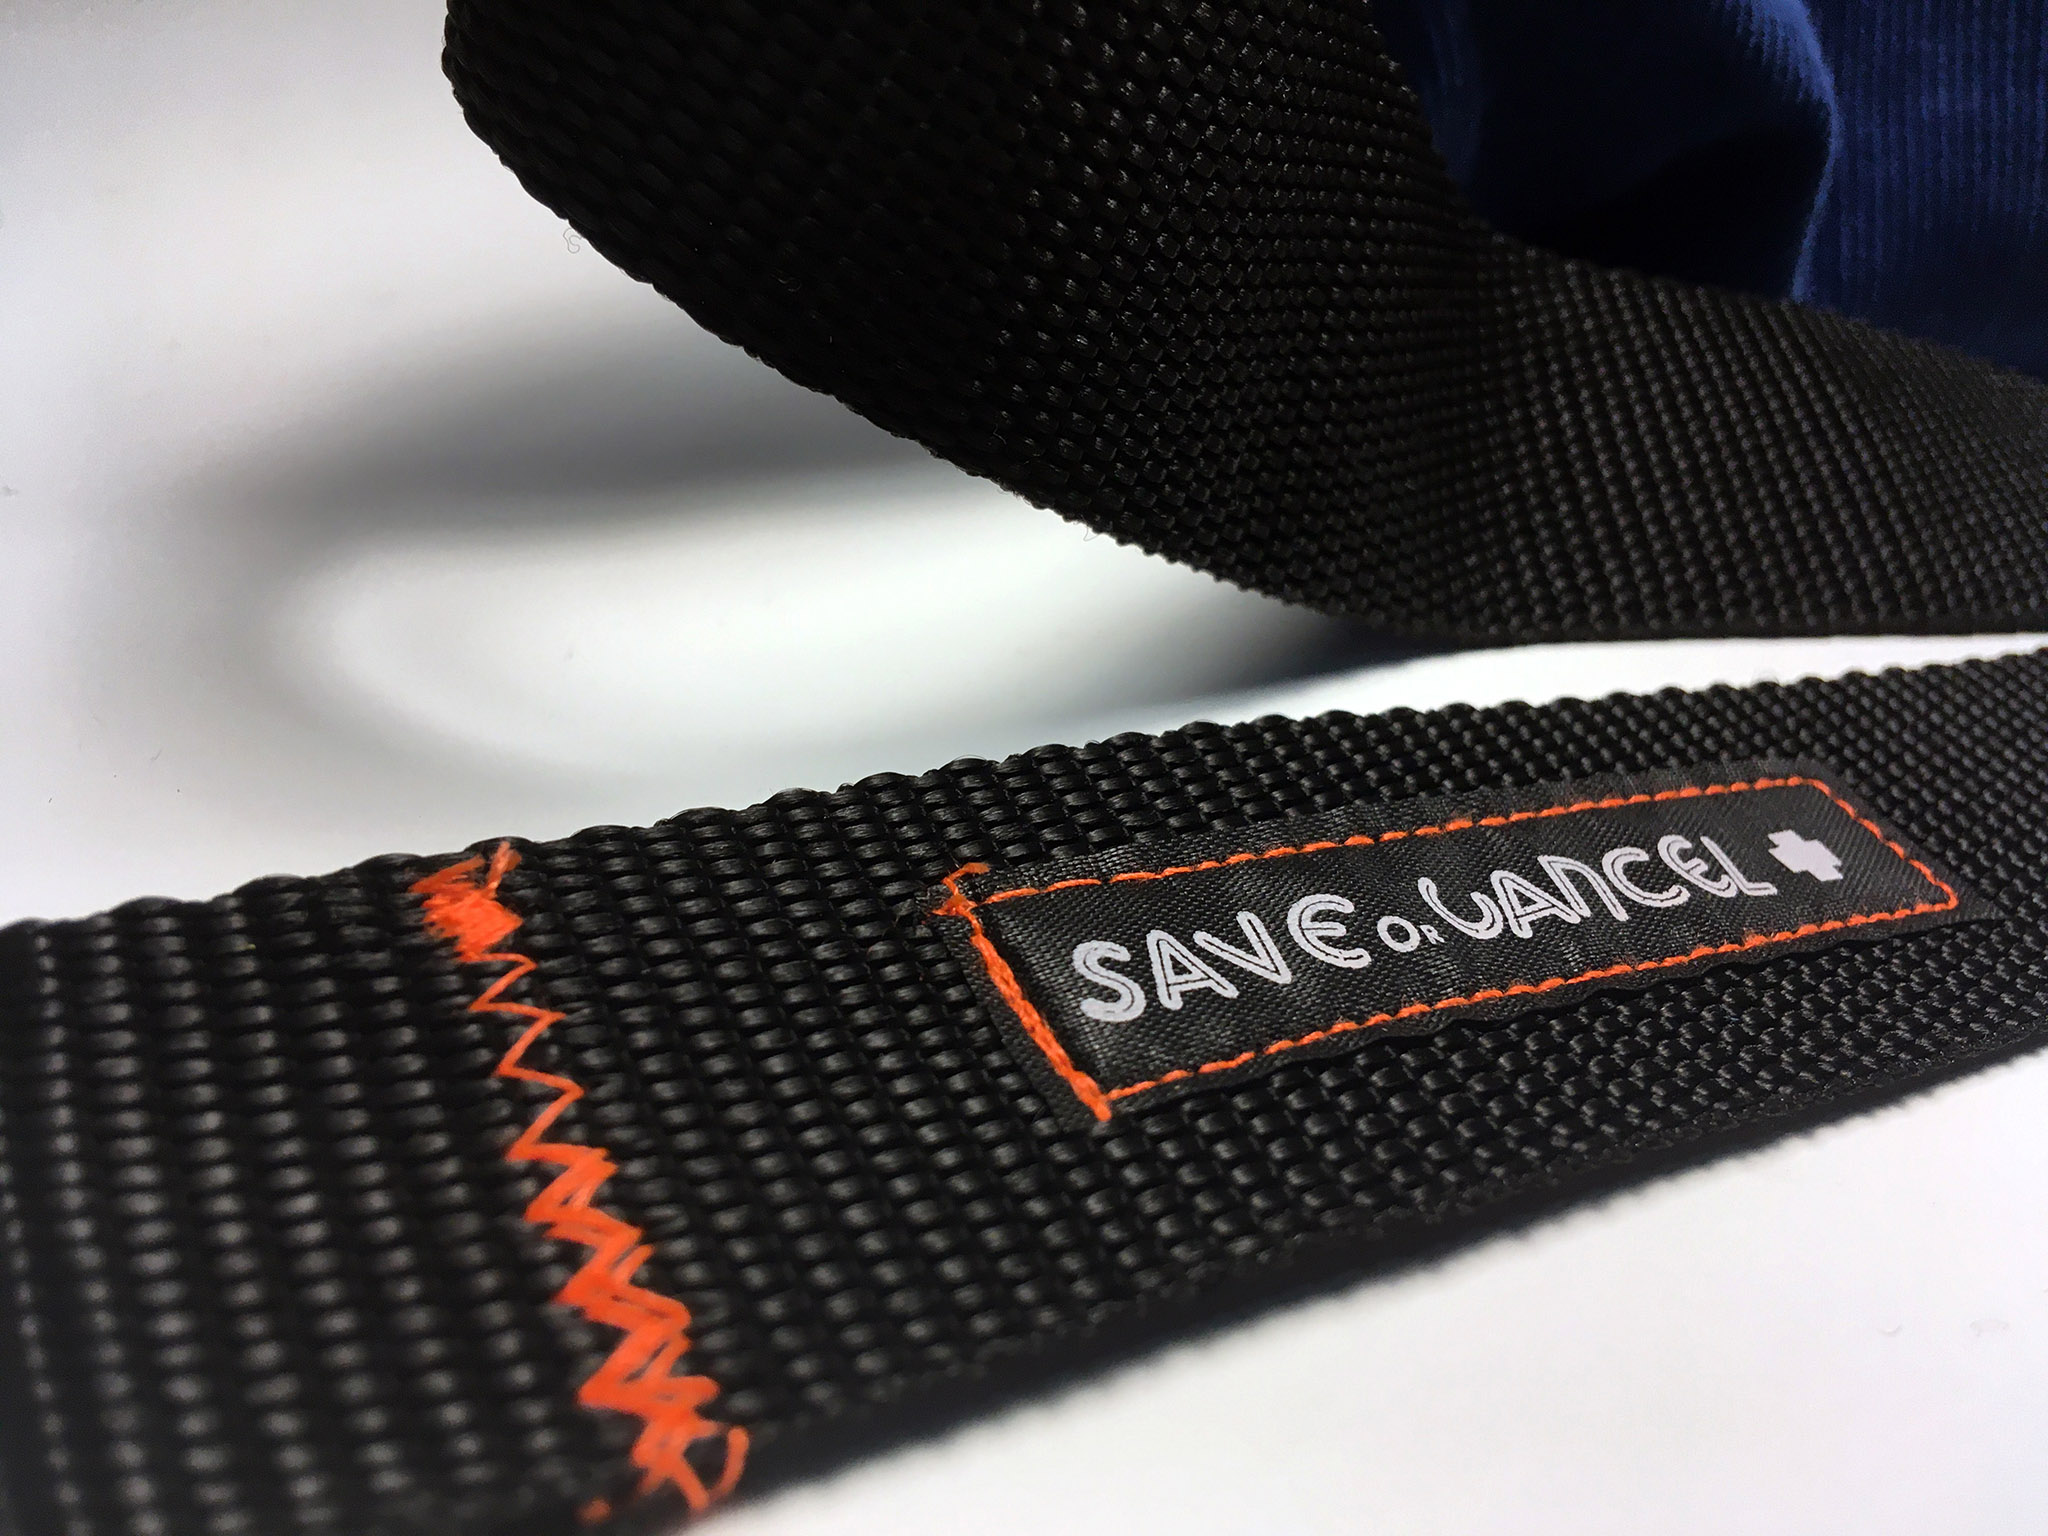 save or cancel x feeder.ro - login 4 fanny pack blue corduroy